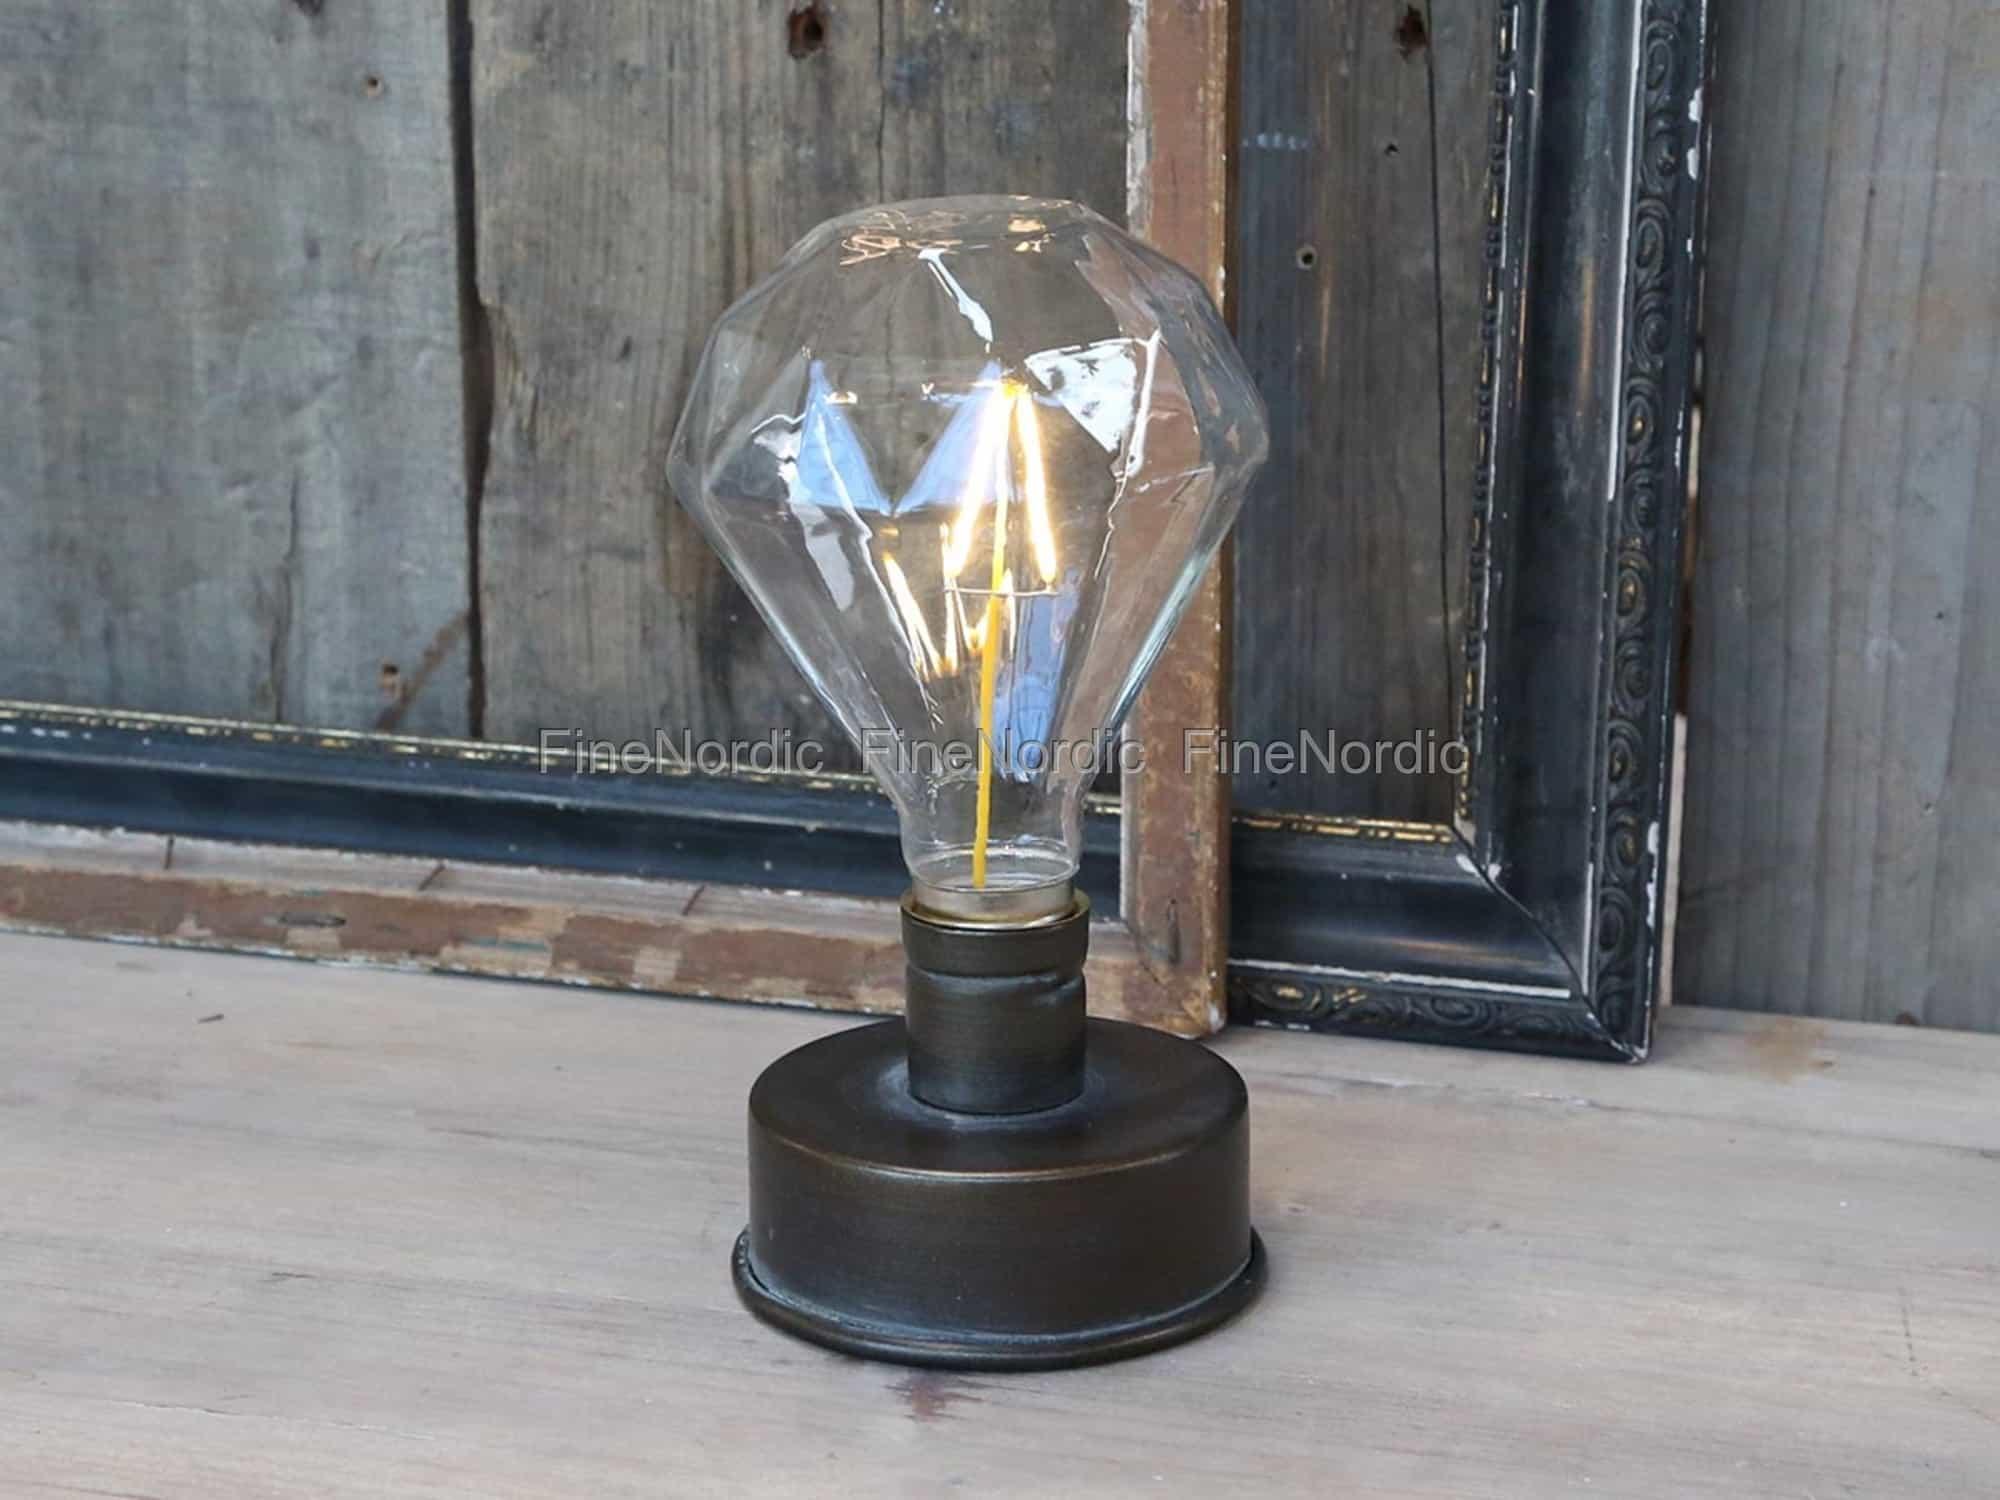 chic antique lampe mit diamant gl hbirne f r batterie. Black Bedroom Furniture Sets. Home Design Ideas